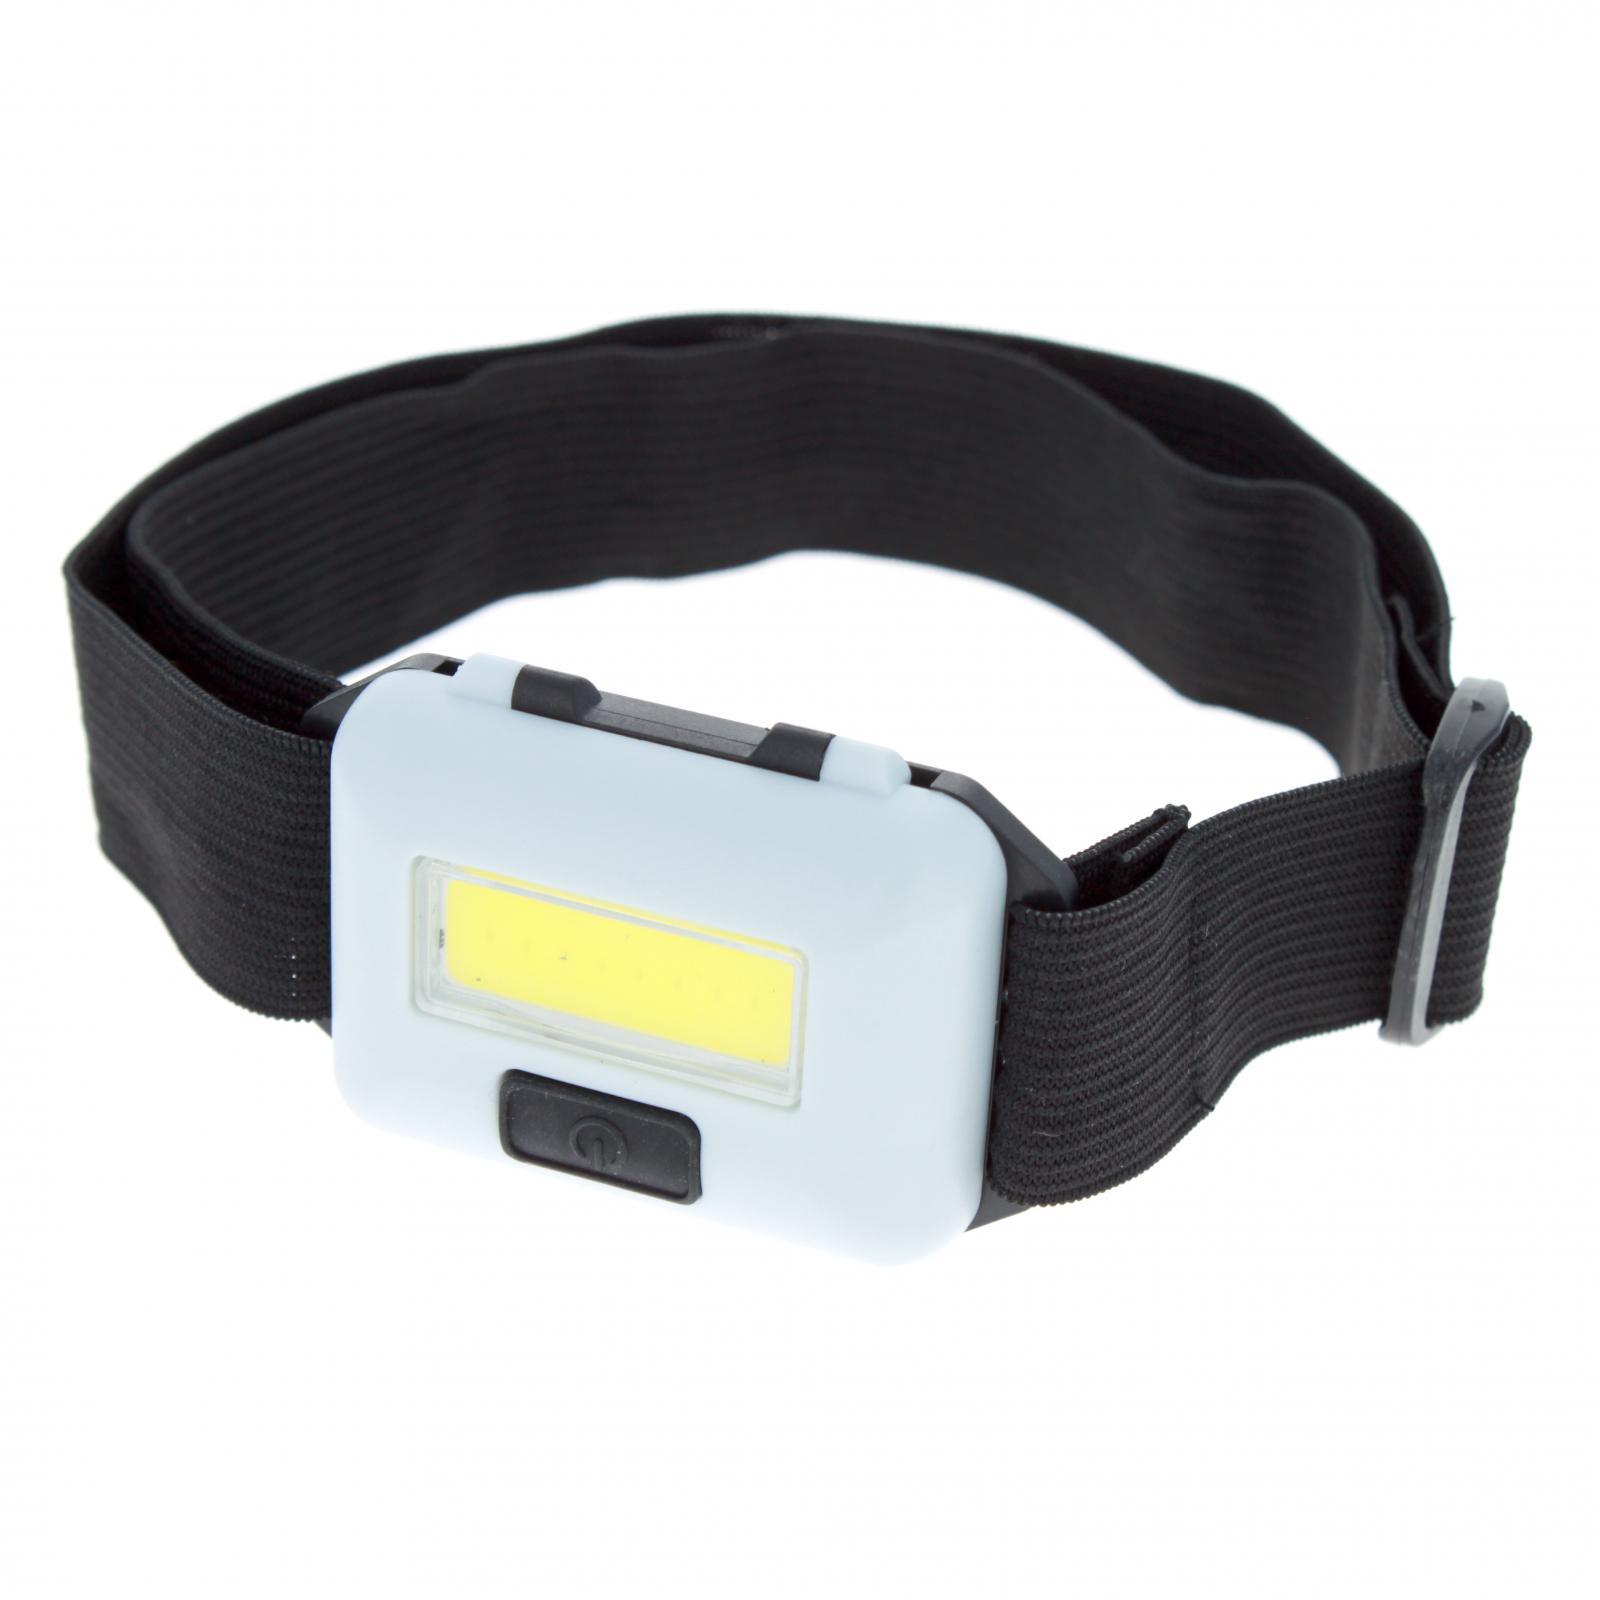 ASR Outdoor 3 in 1 Head Lamp 1.5 Watt COB Bulb 200 Lumen LED